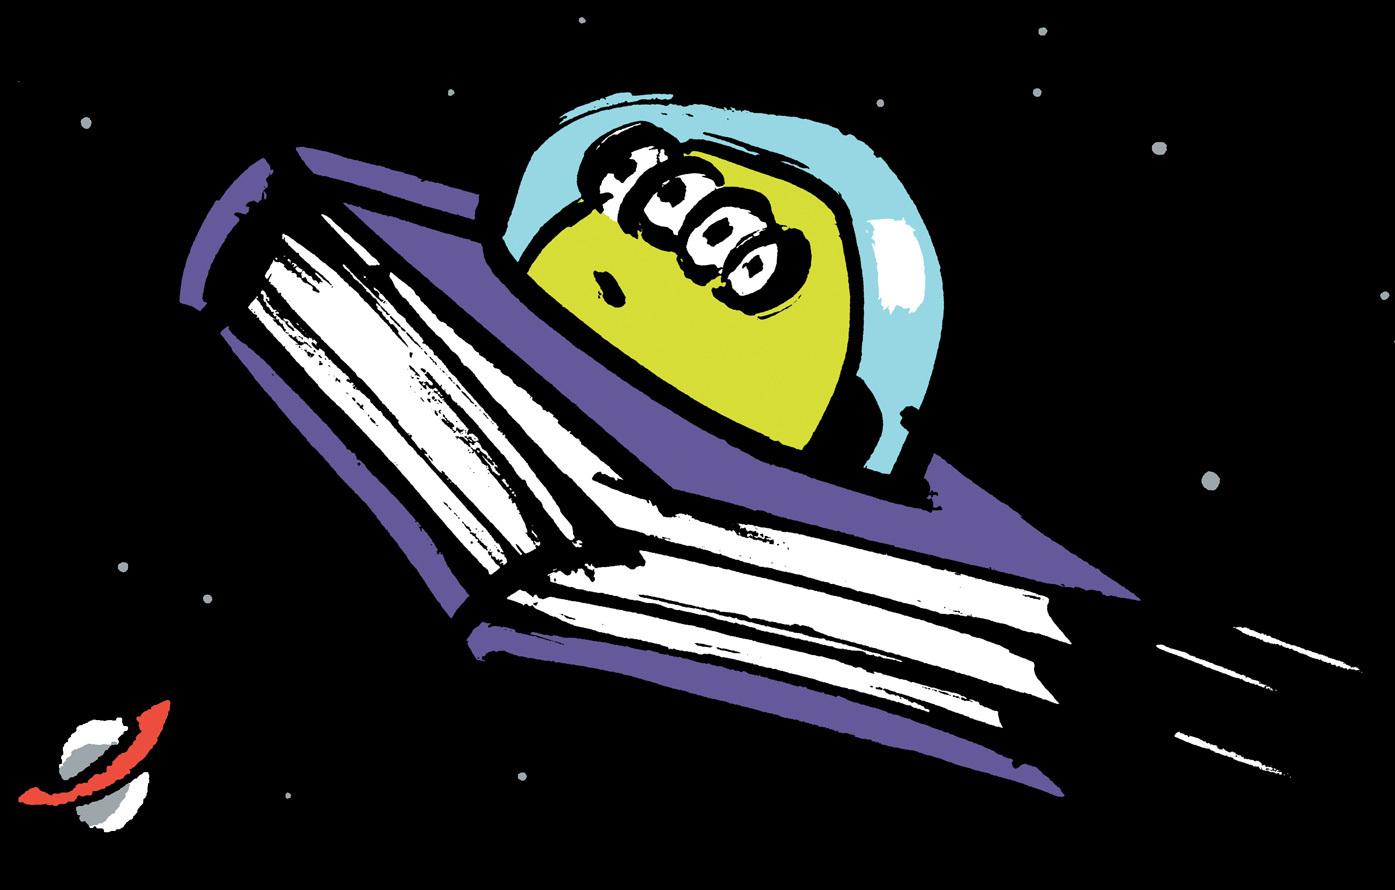 Sci fi genre essays